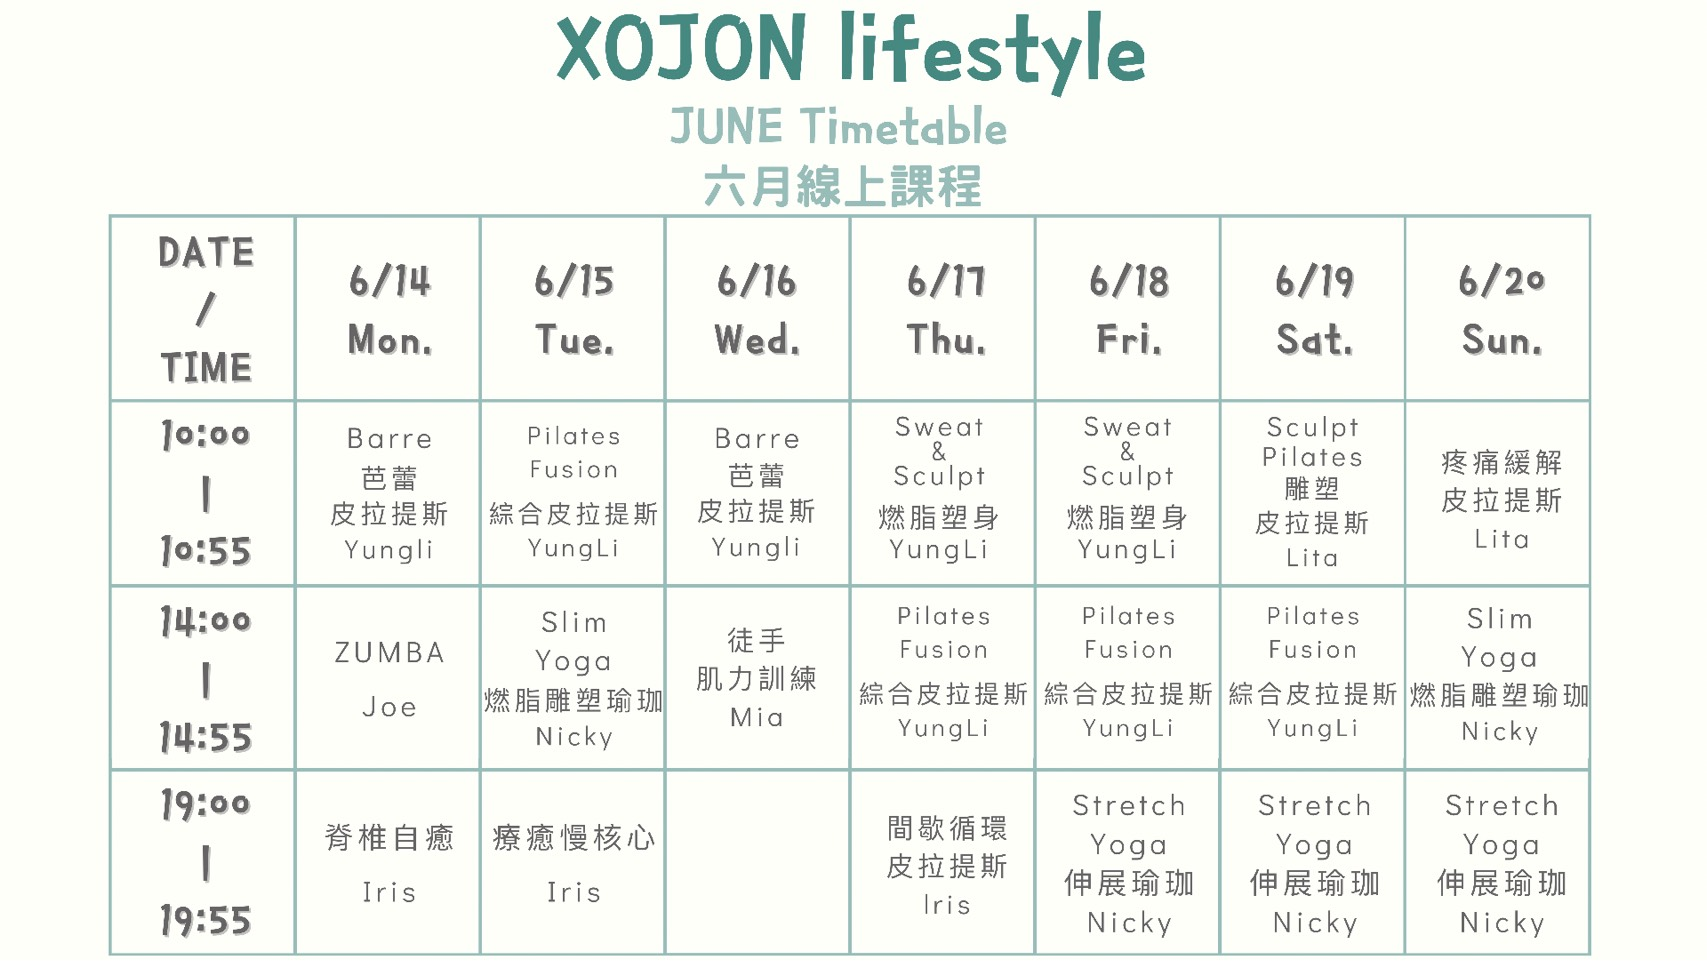 XOJON lifestyle 精選線上視訊瑜珈、墊上皮拉提斯課程